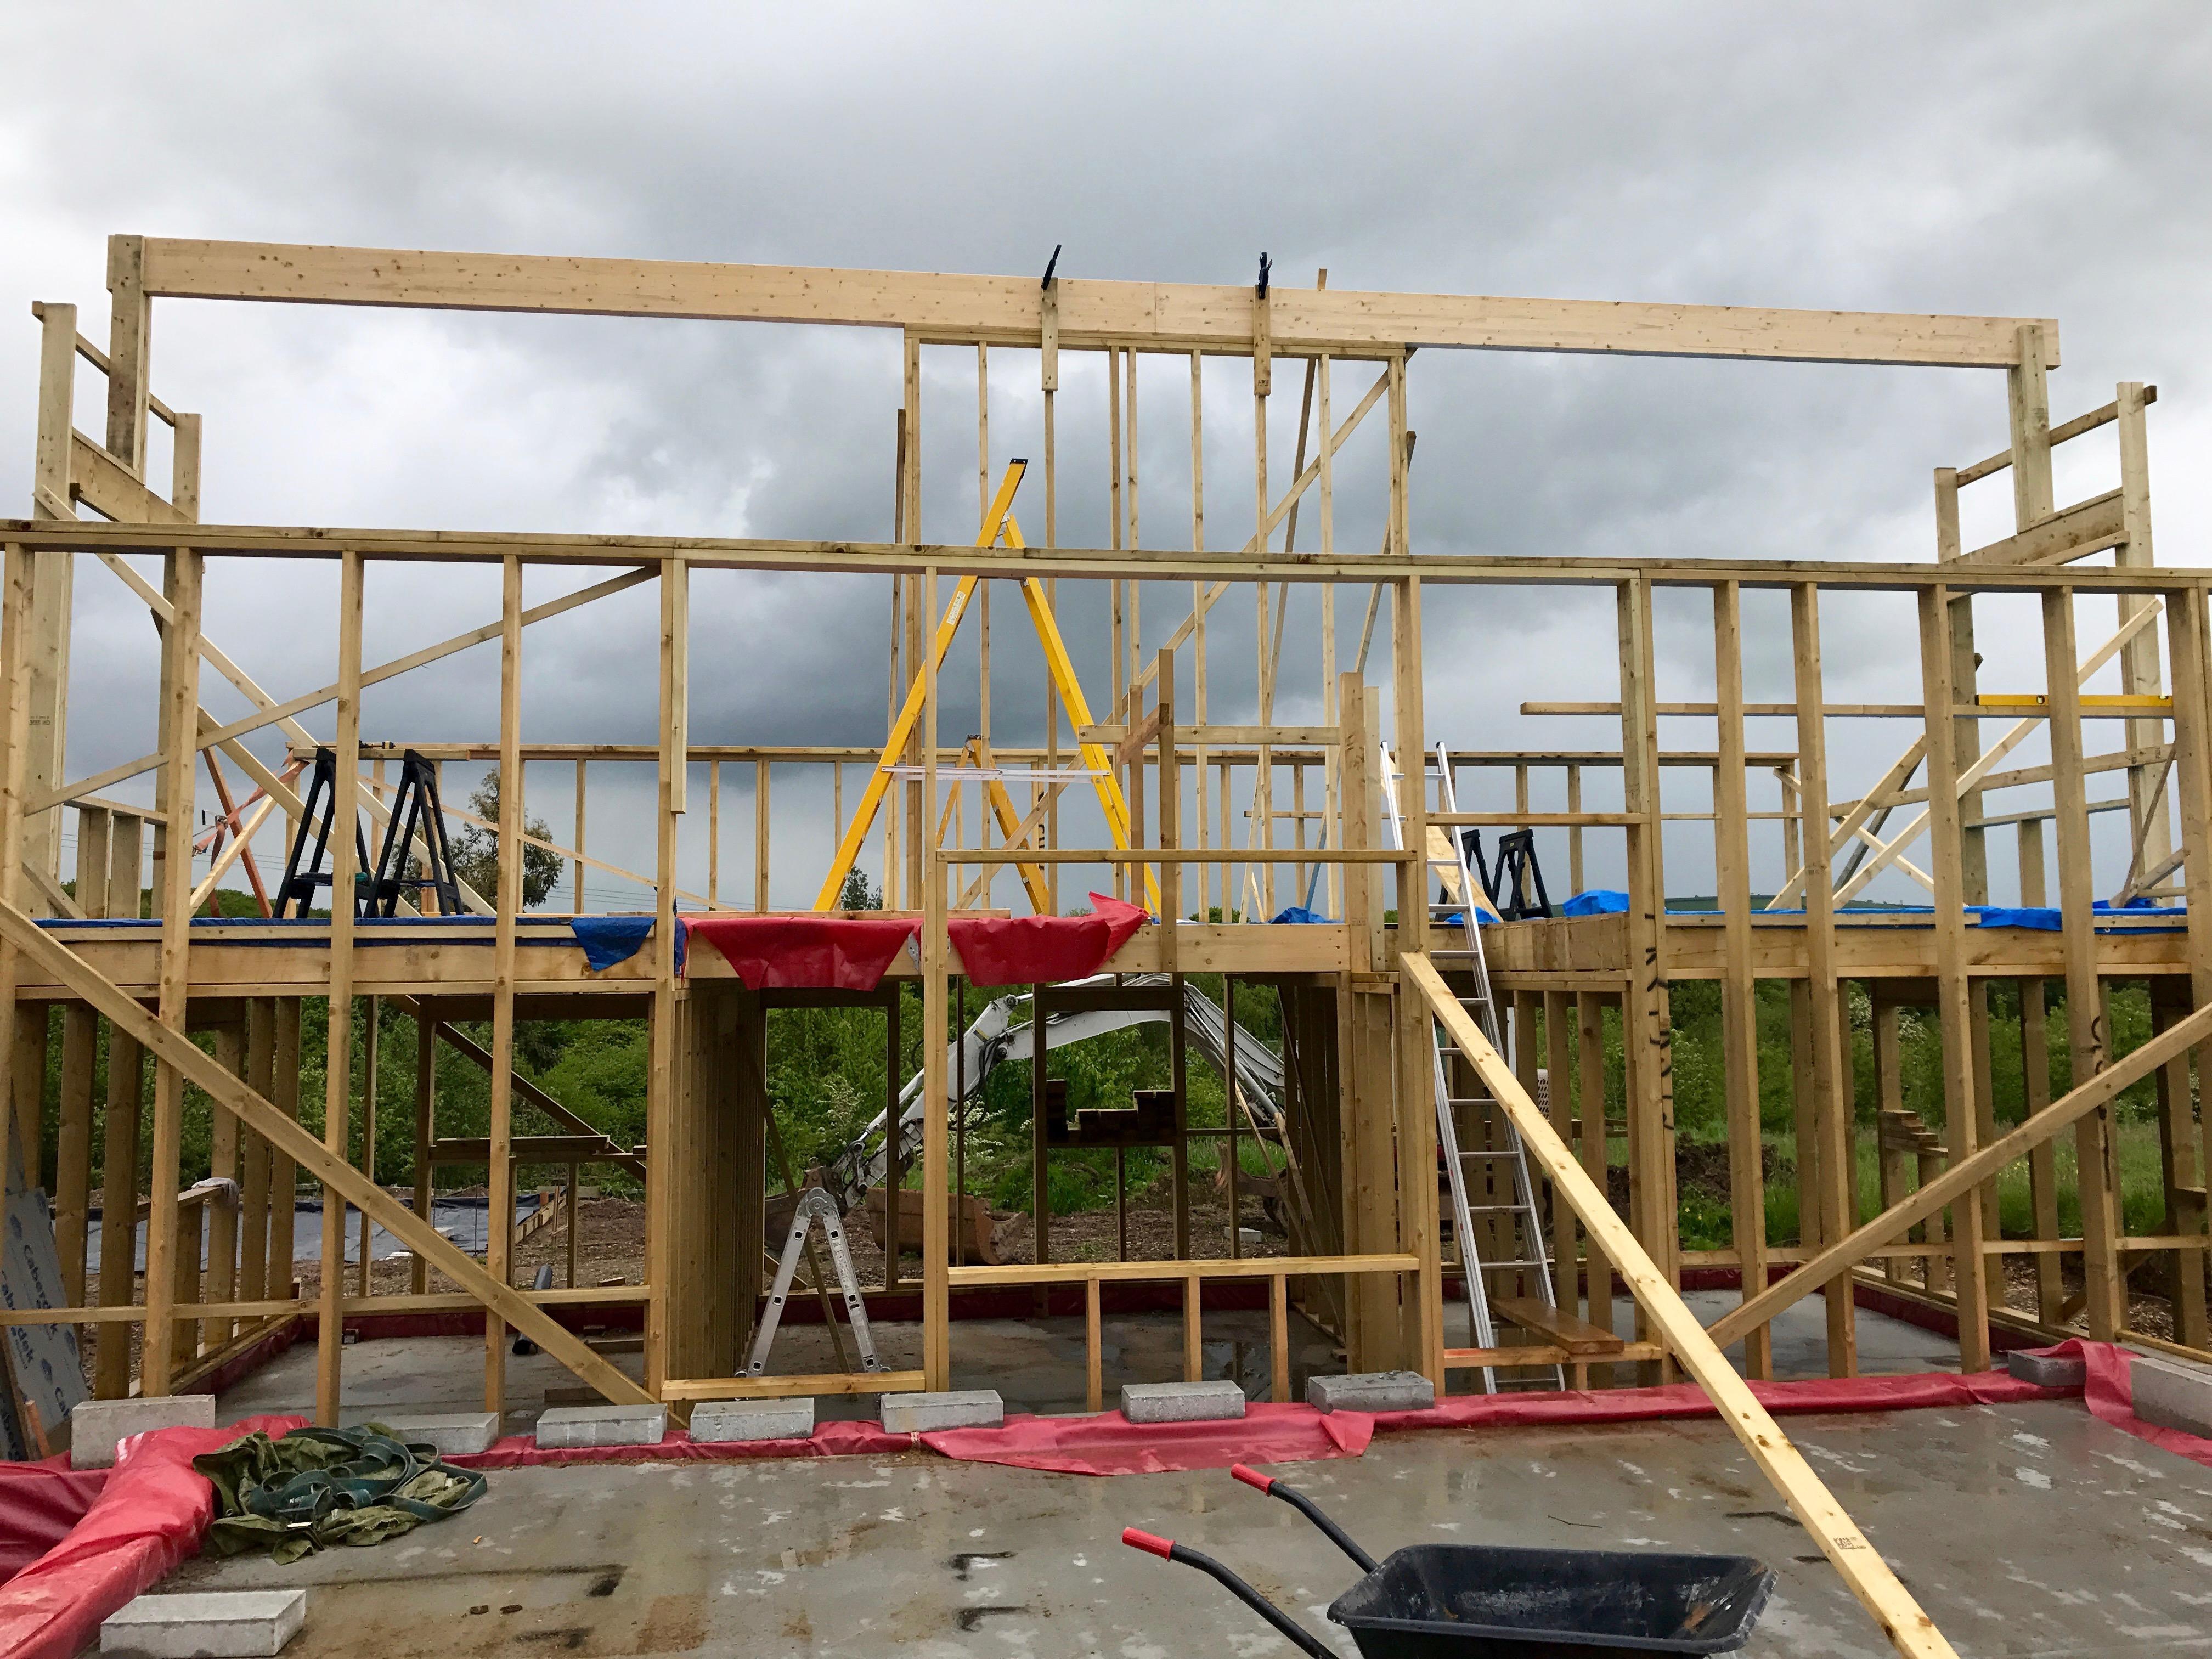 Vcl In Warm Roof Roofing Tiling Amp Slating Buildhub Org Uk